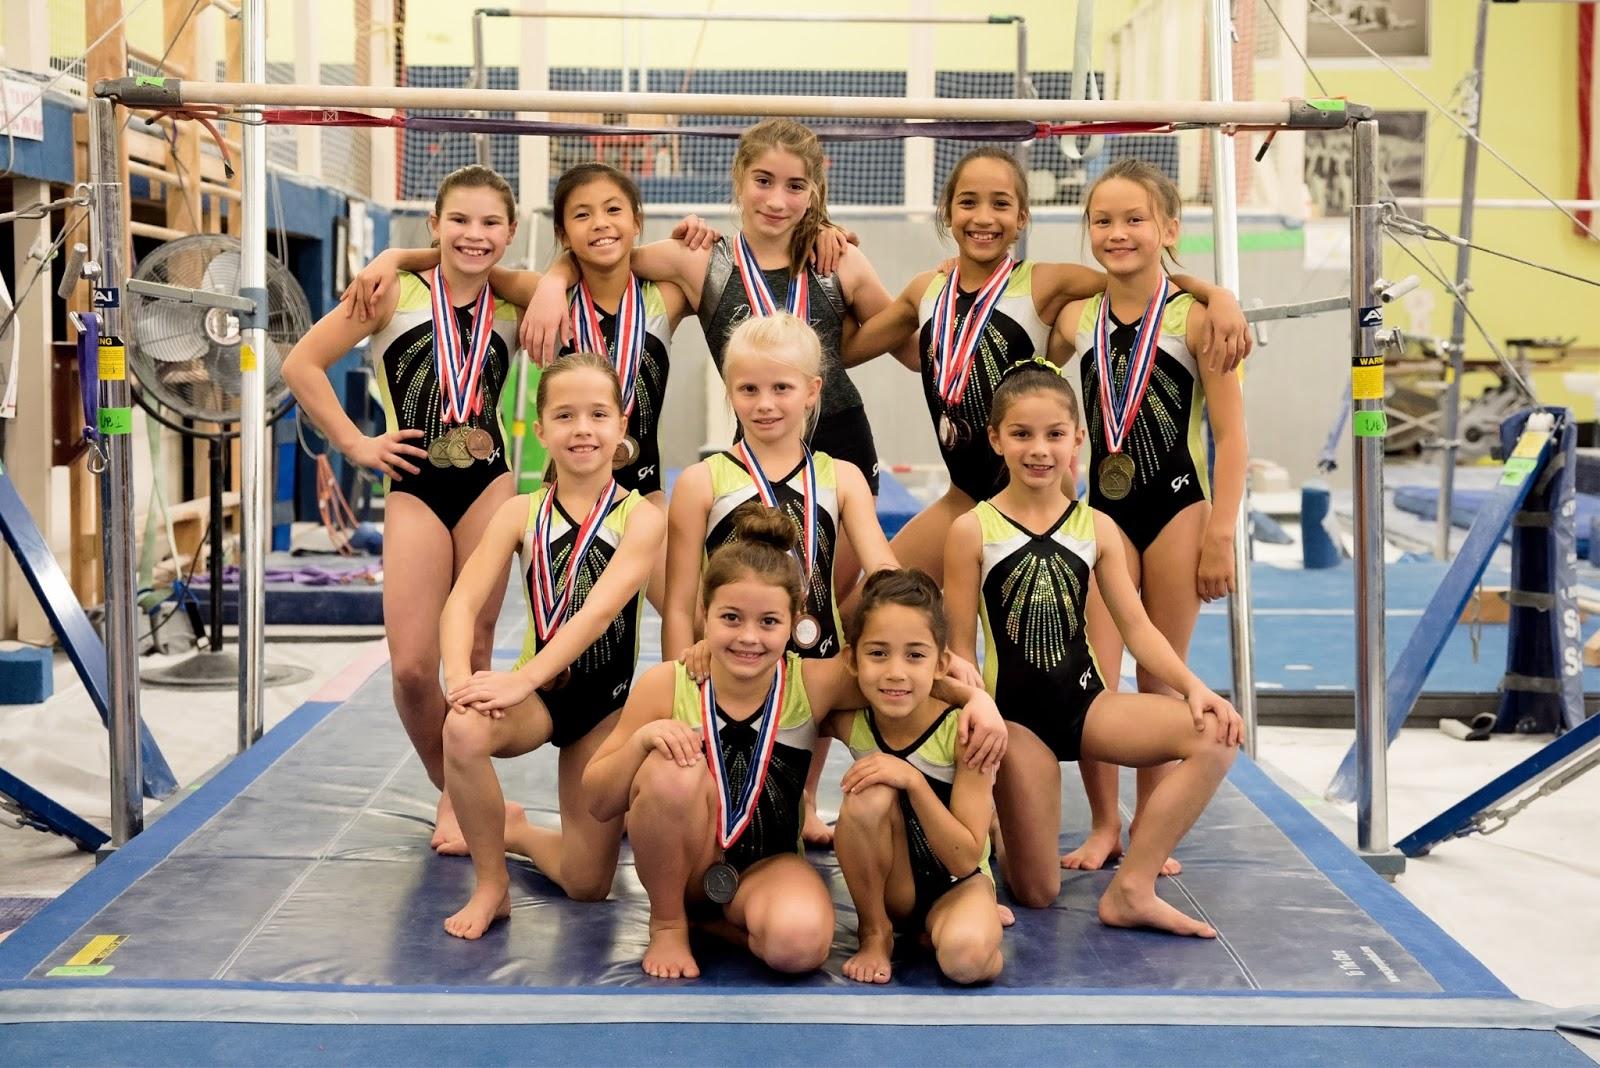 wright gymnastics meet results